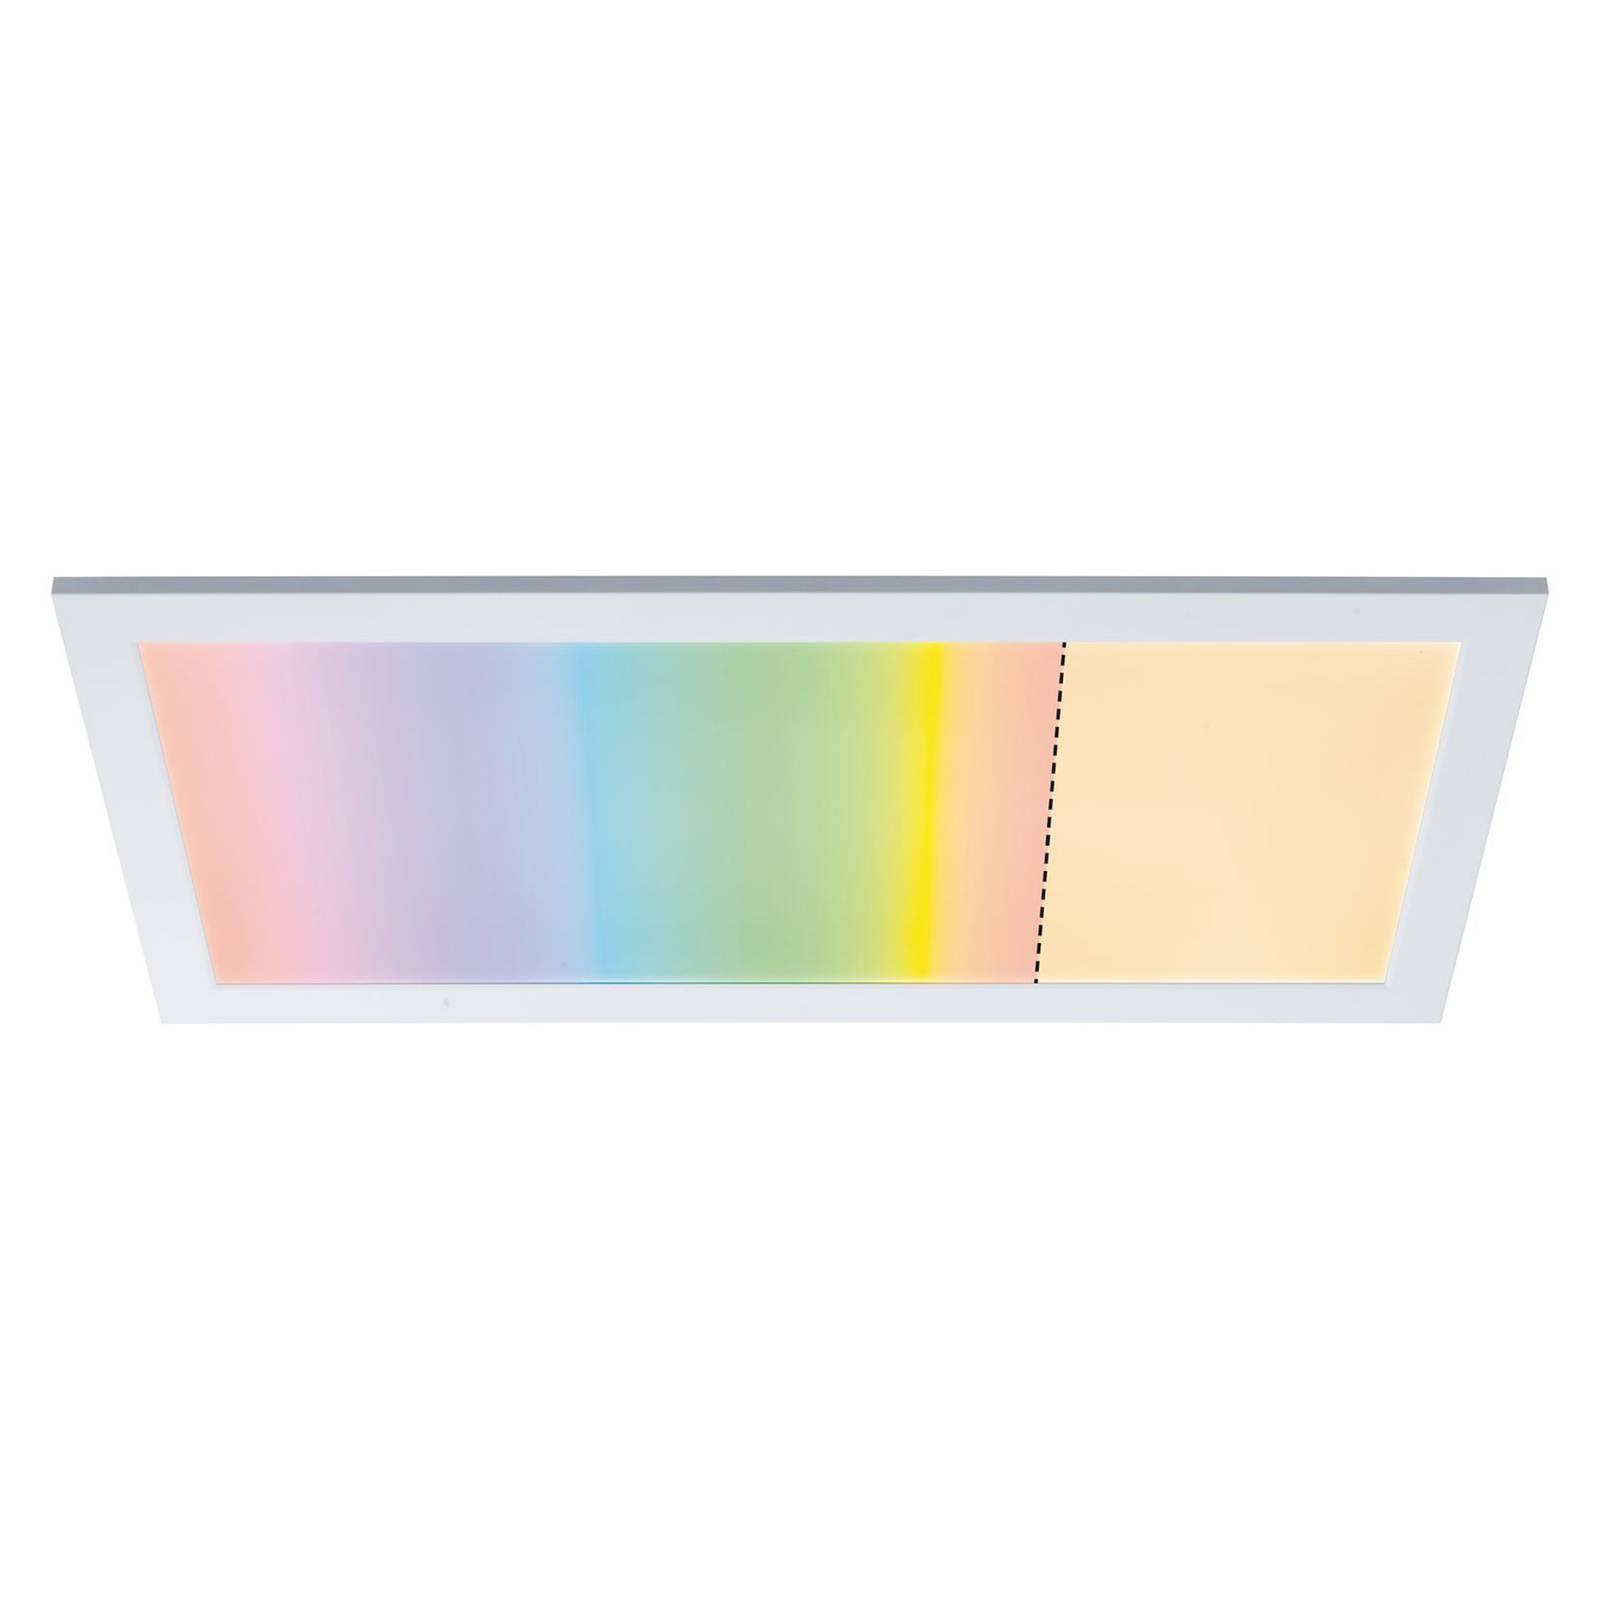 Paulmann Amaris LED-Panel, ZigBee, 60x30cm, RGBW